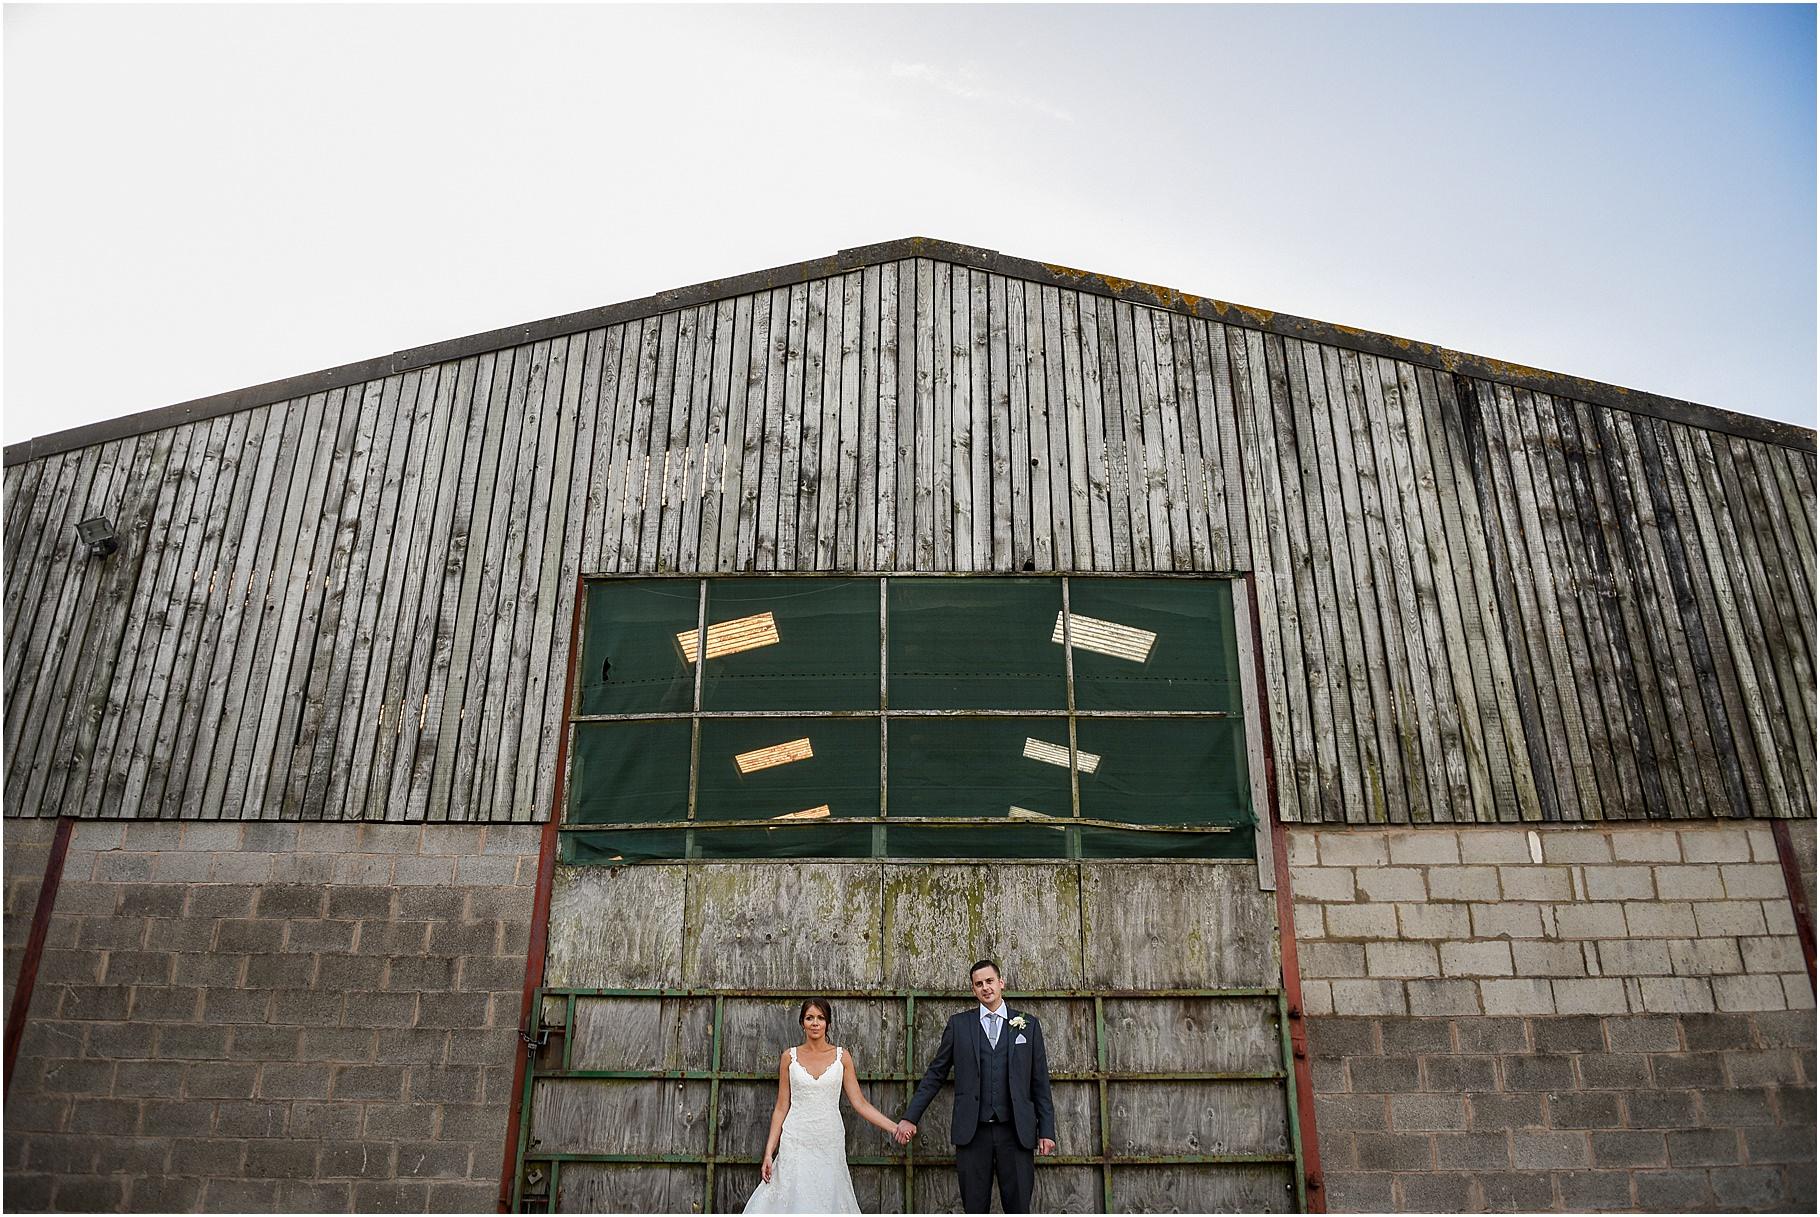 dan-wootton-photography-2017-weddings-001.jpg